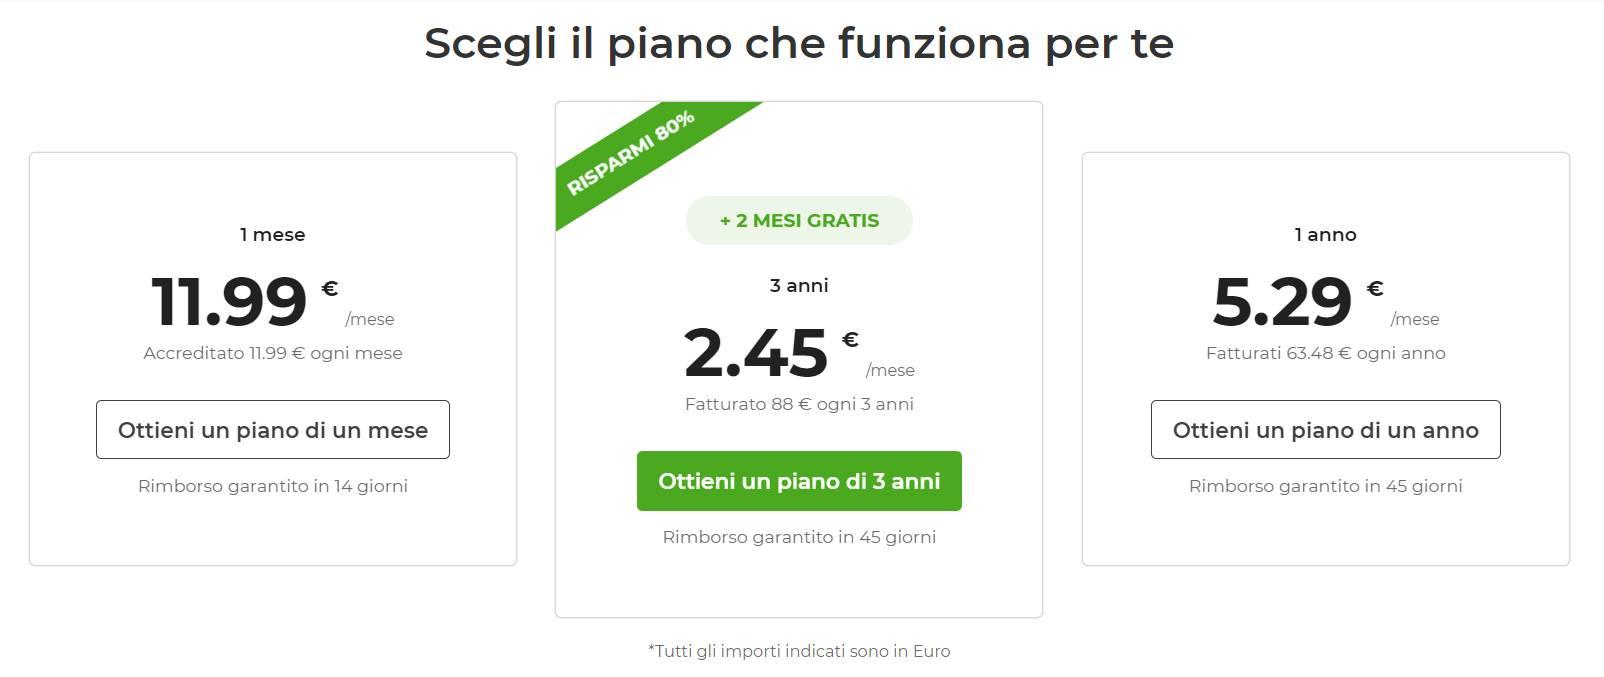 CyberGhost VPN: 3 anni a 2,45€ al mese più due mesi gratis